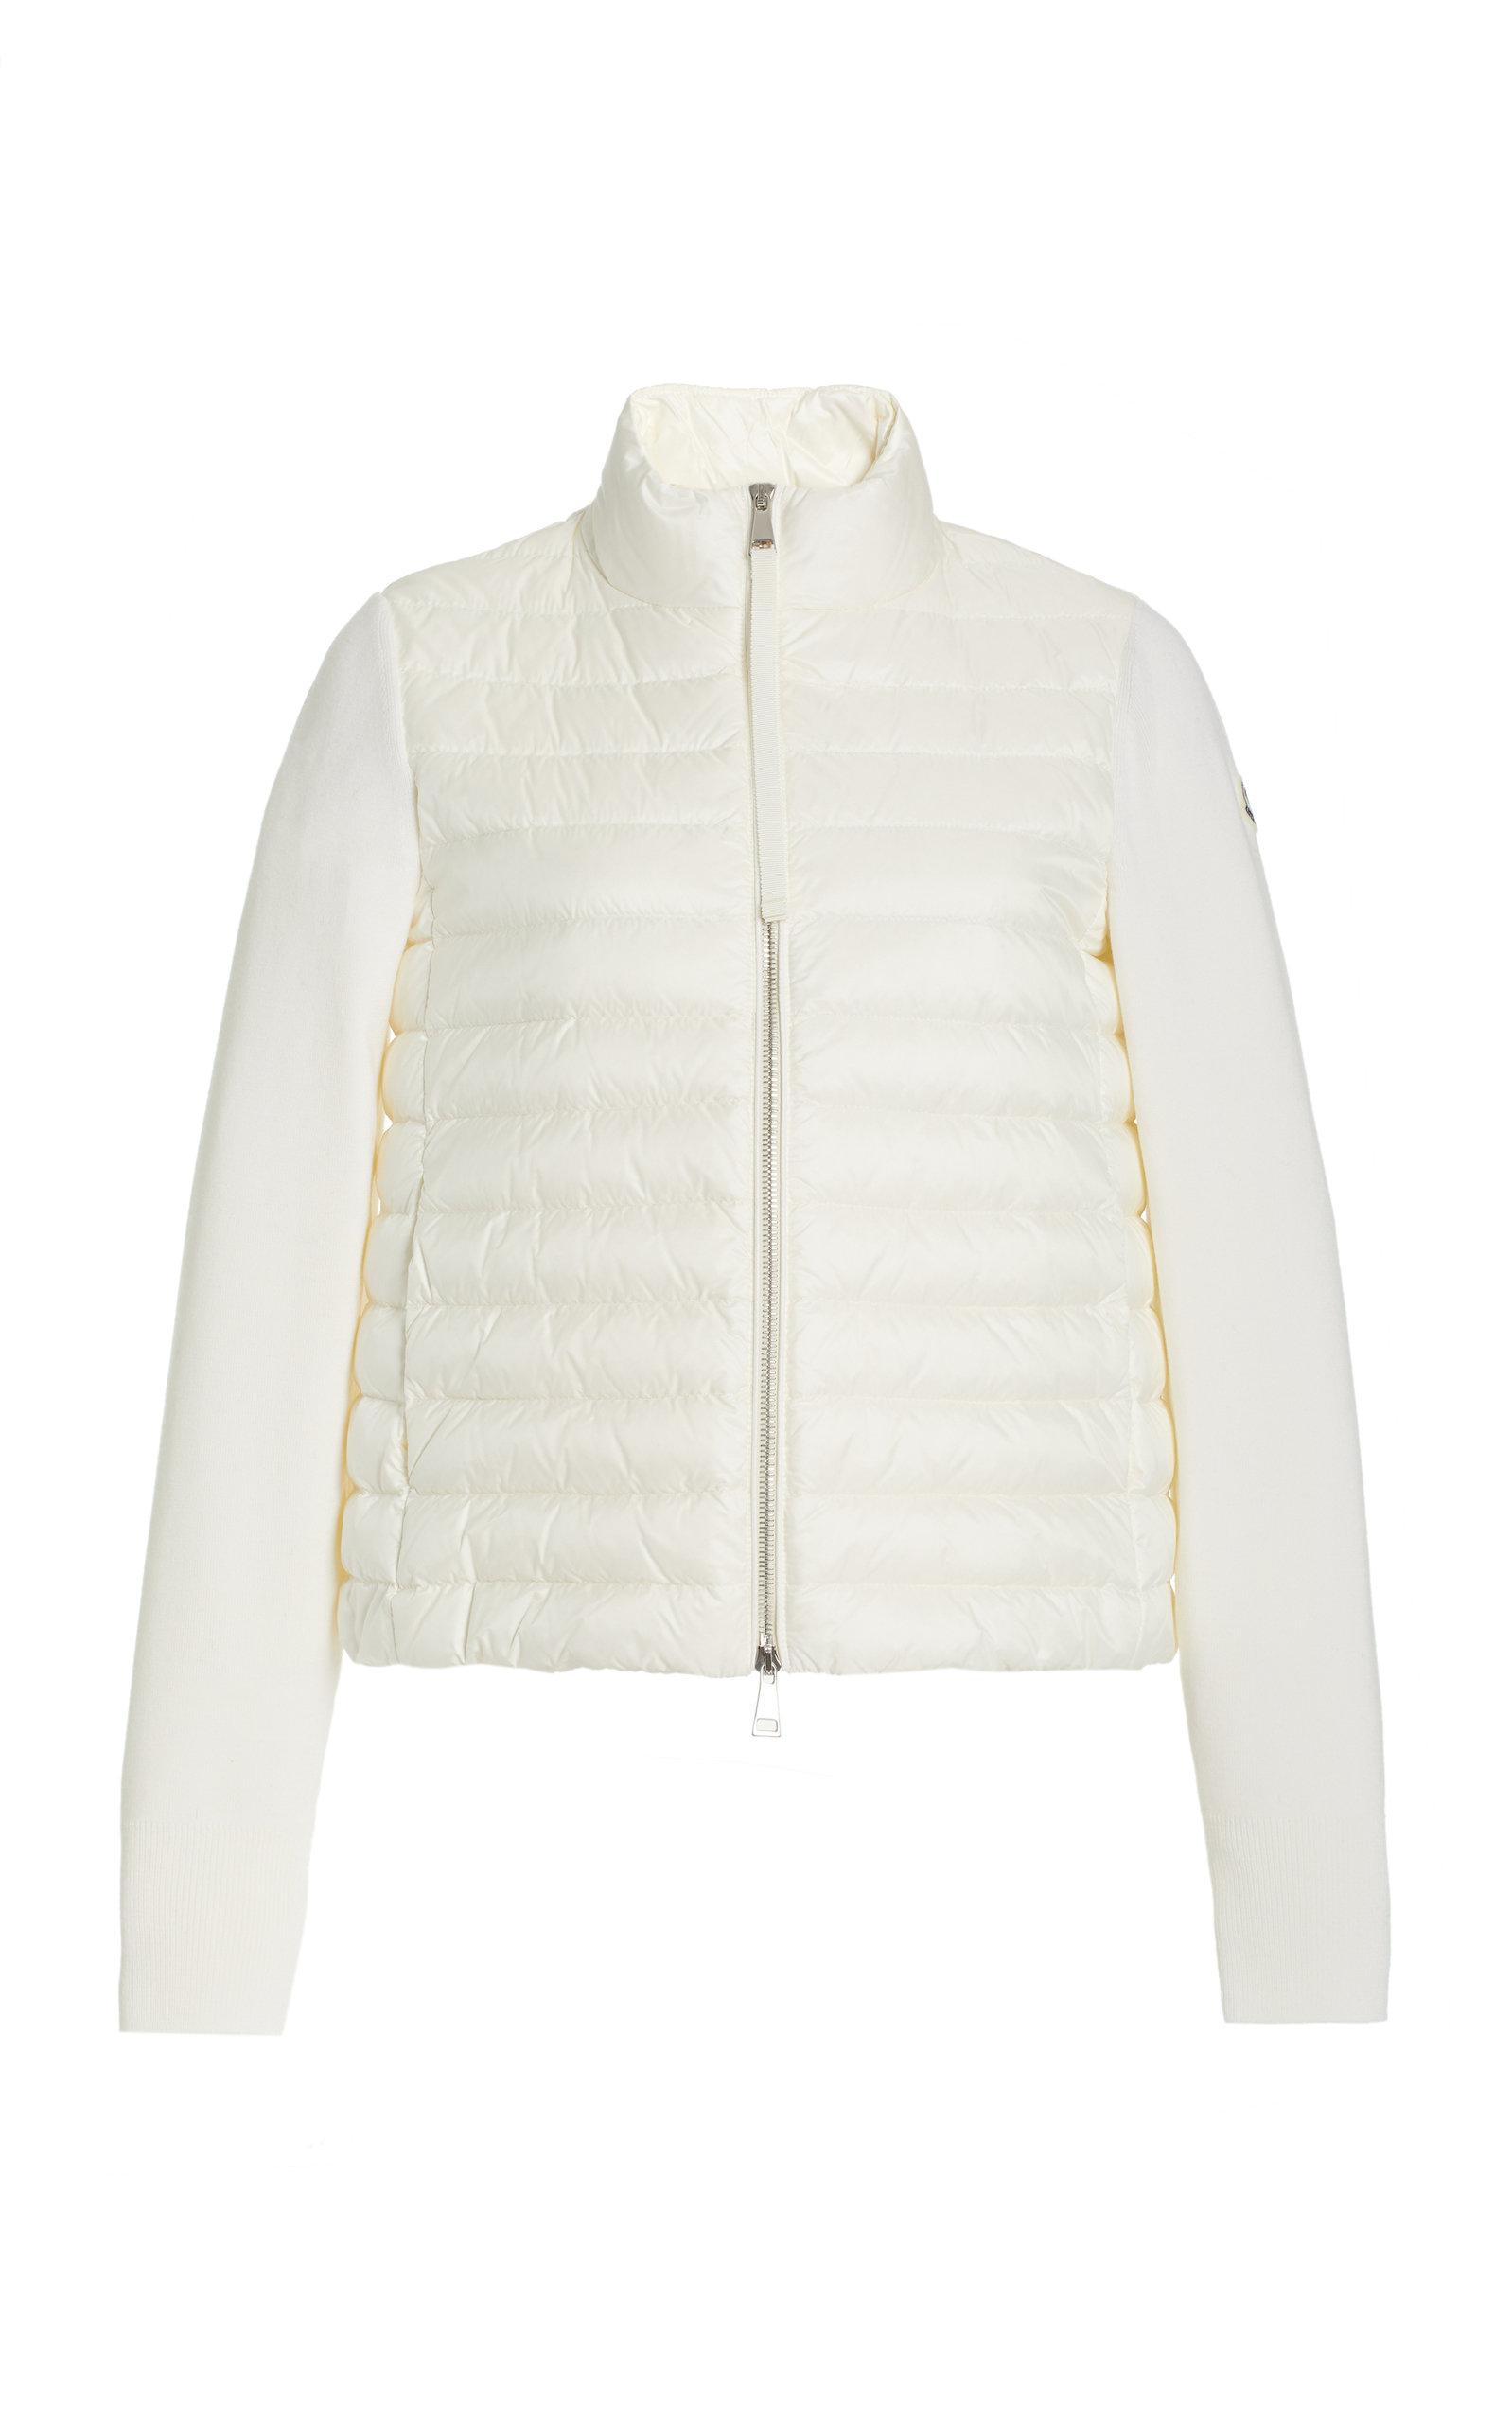 Moncler - Women's Down-Paneled Wool Jacket - White - Moda Operandi